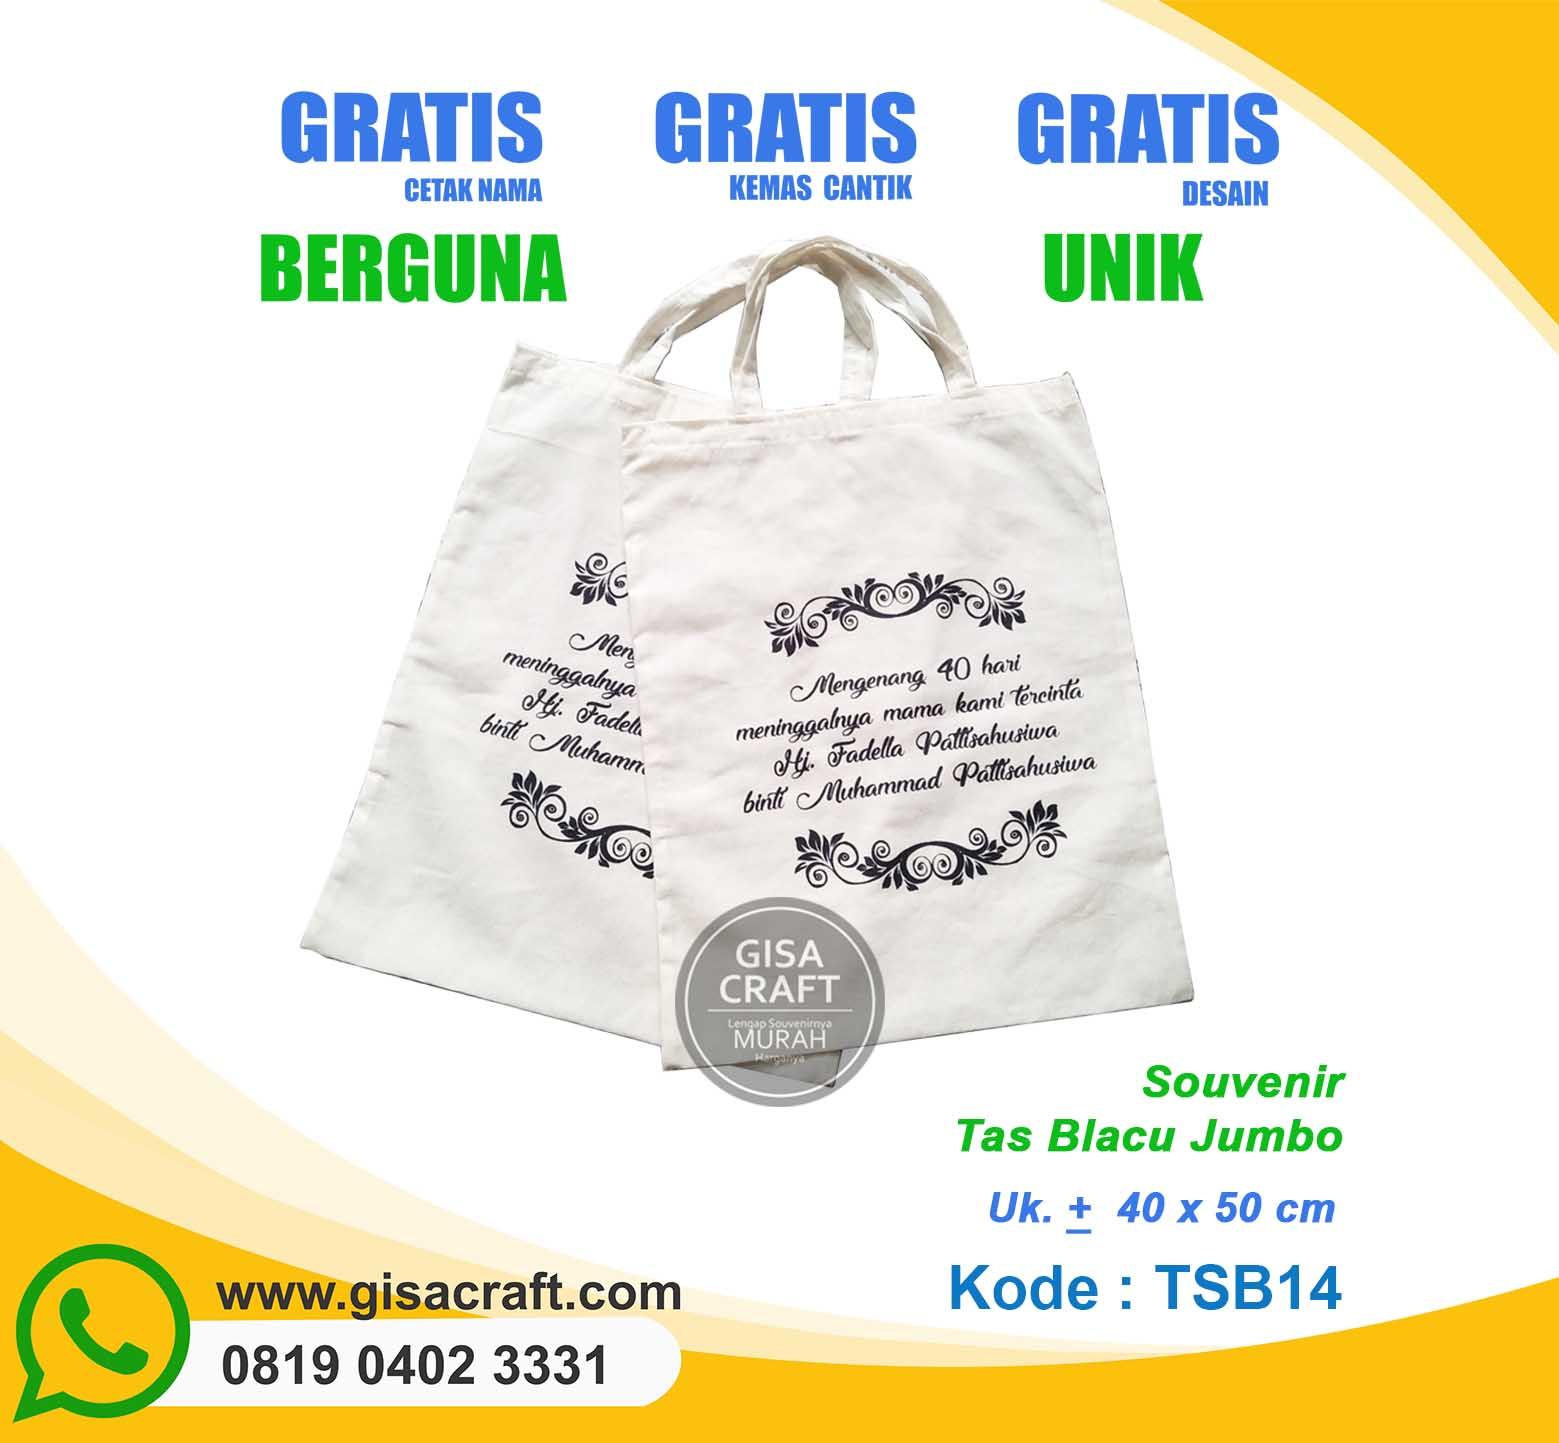 Souvenir Tas Blacu Jumbo TSB14